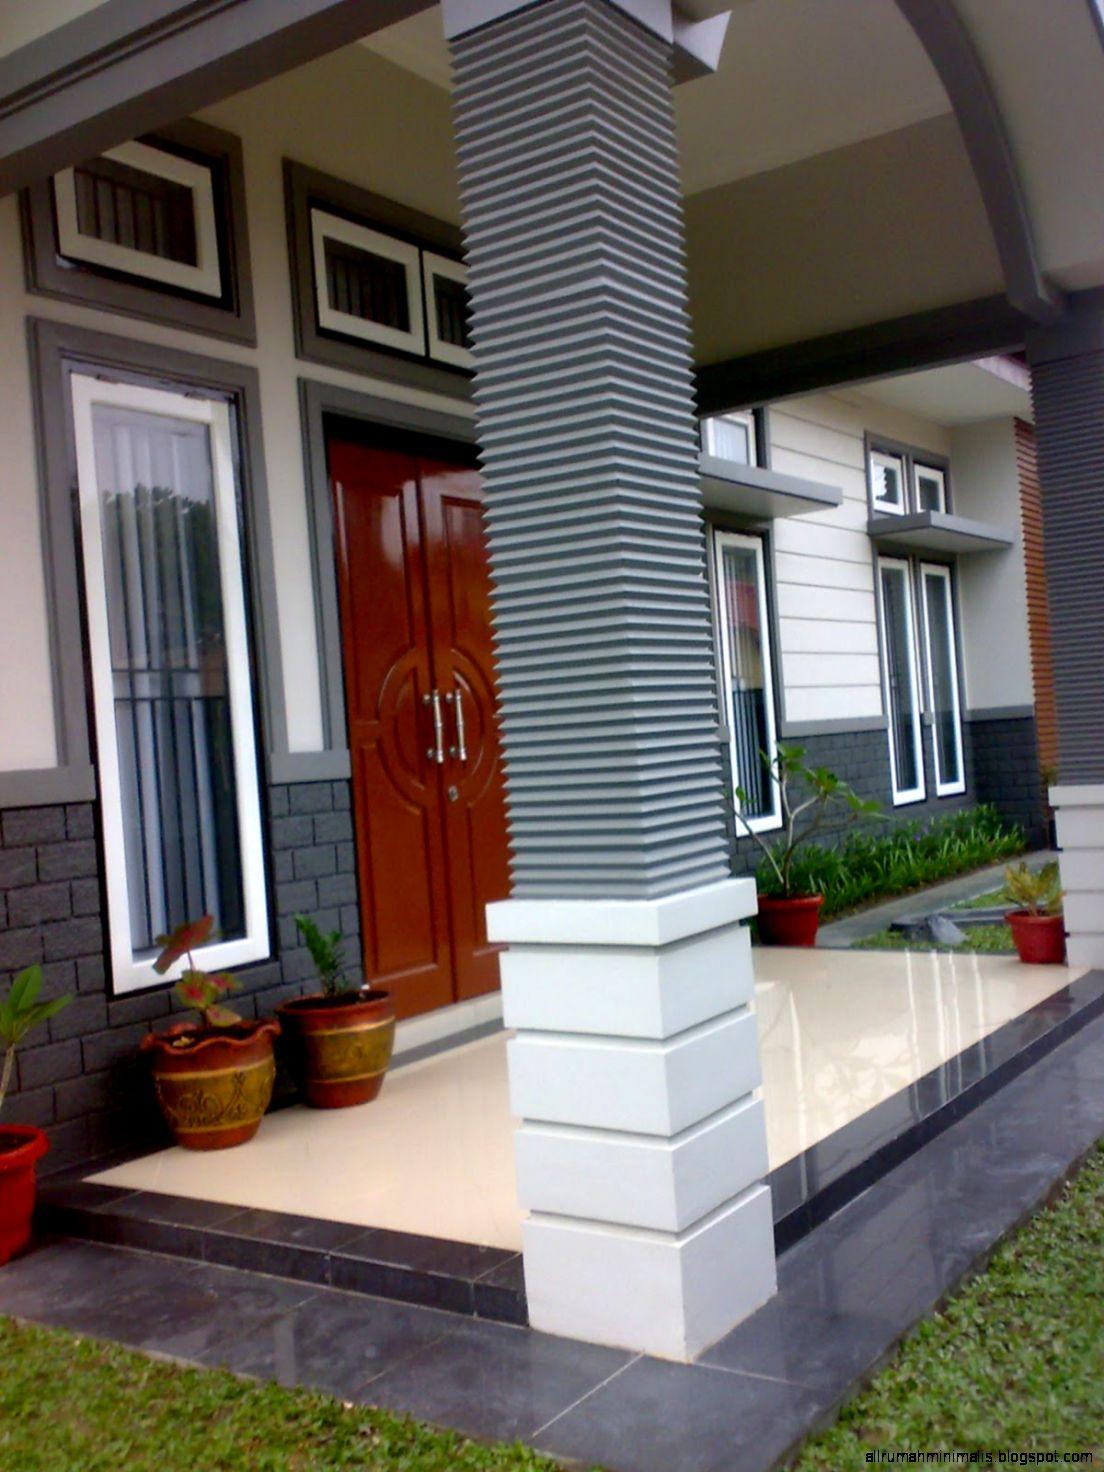 Profil Rumah Minimalis : profil, rumah, minimalis, Tiang, Rumah, Minimalis, Design